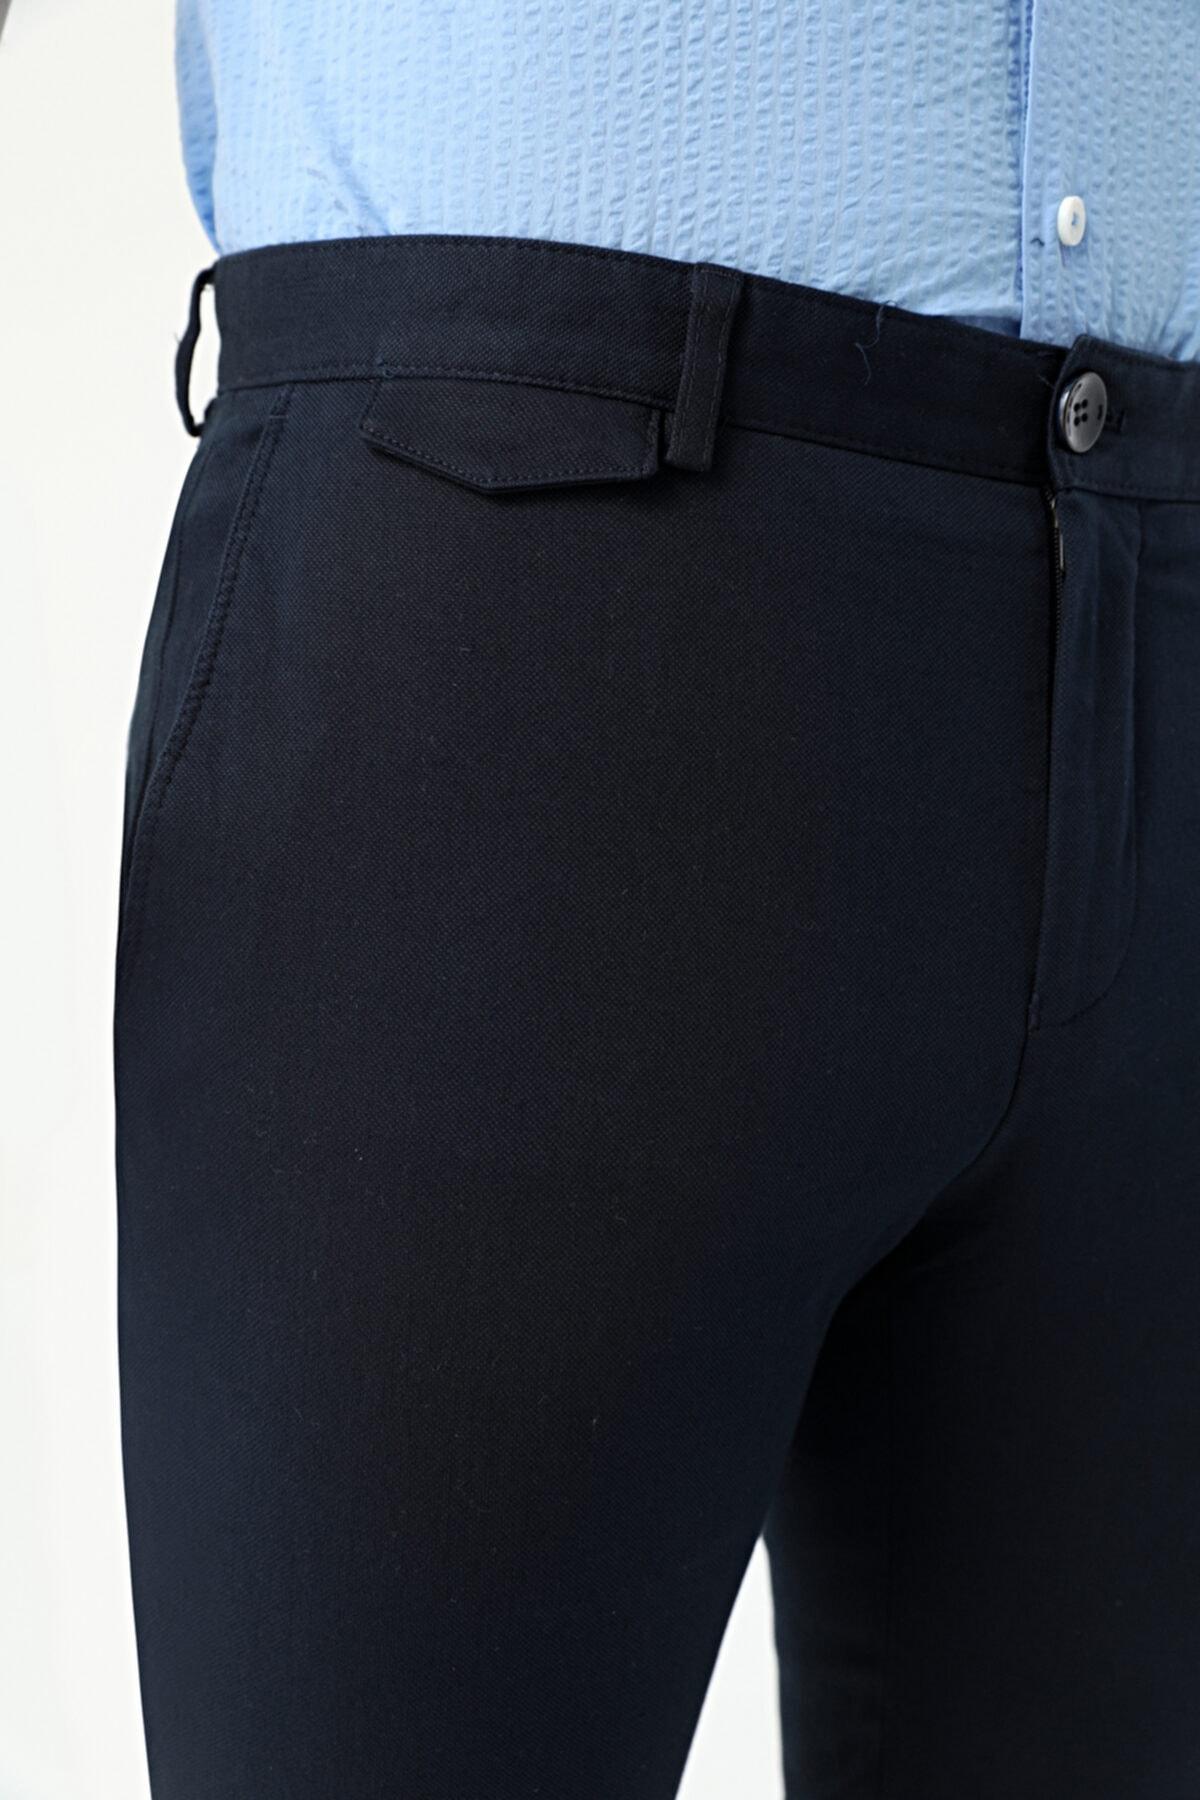 D'S Damat Erkek Lacivert Armürlü Twn Slim Fit Chino Pantolon 2